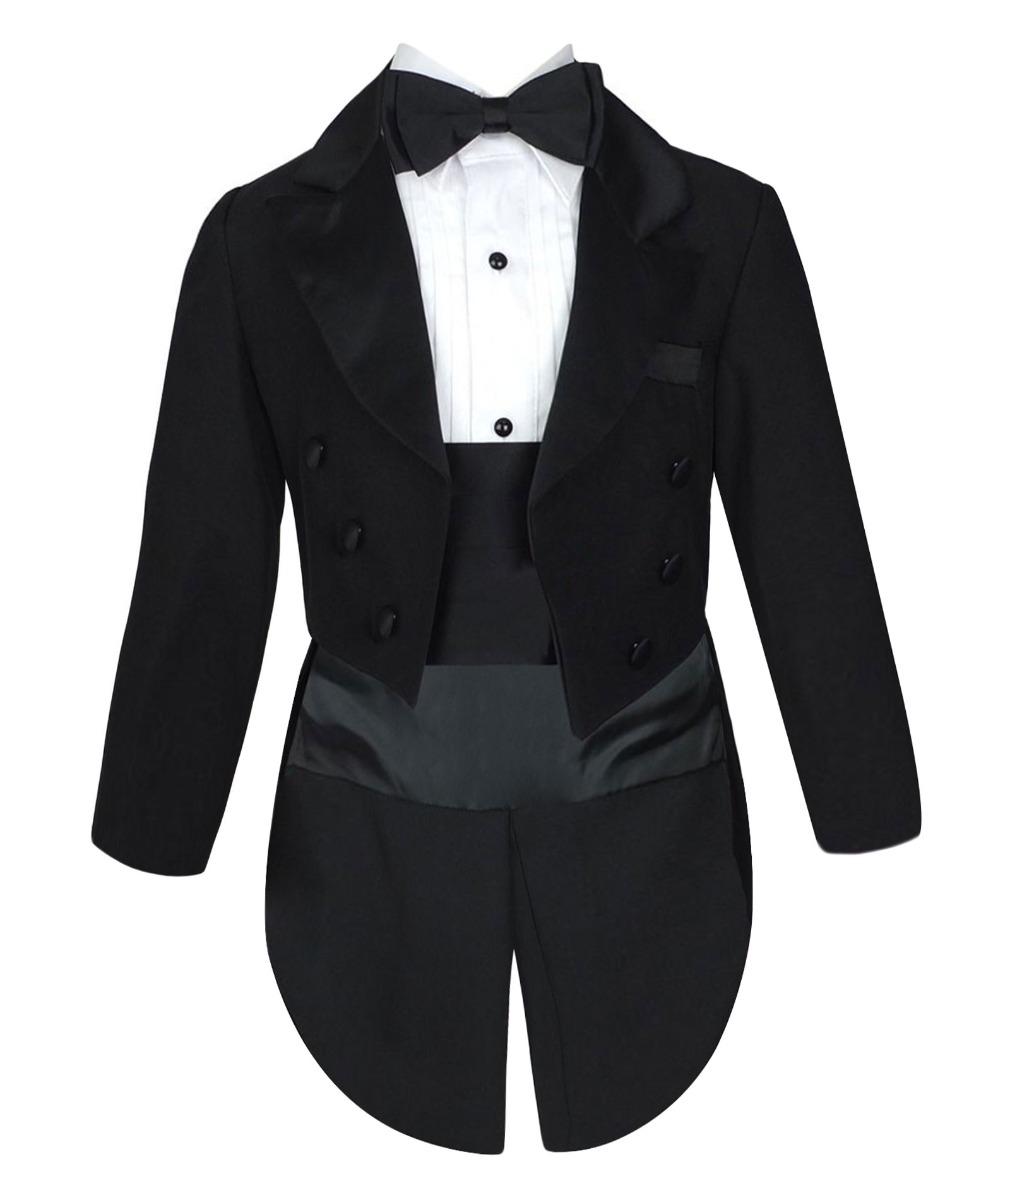 Baby Boys Tuxedo Tail Suit in Black 5 PCS Christening Wedding Pageboy Dinner